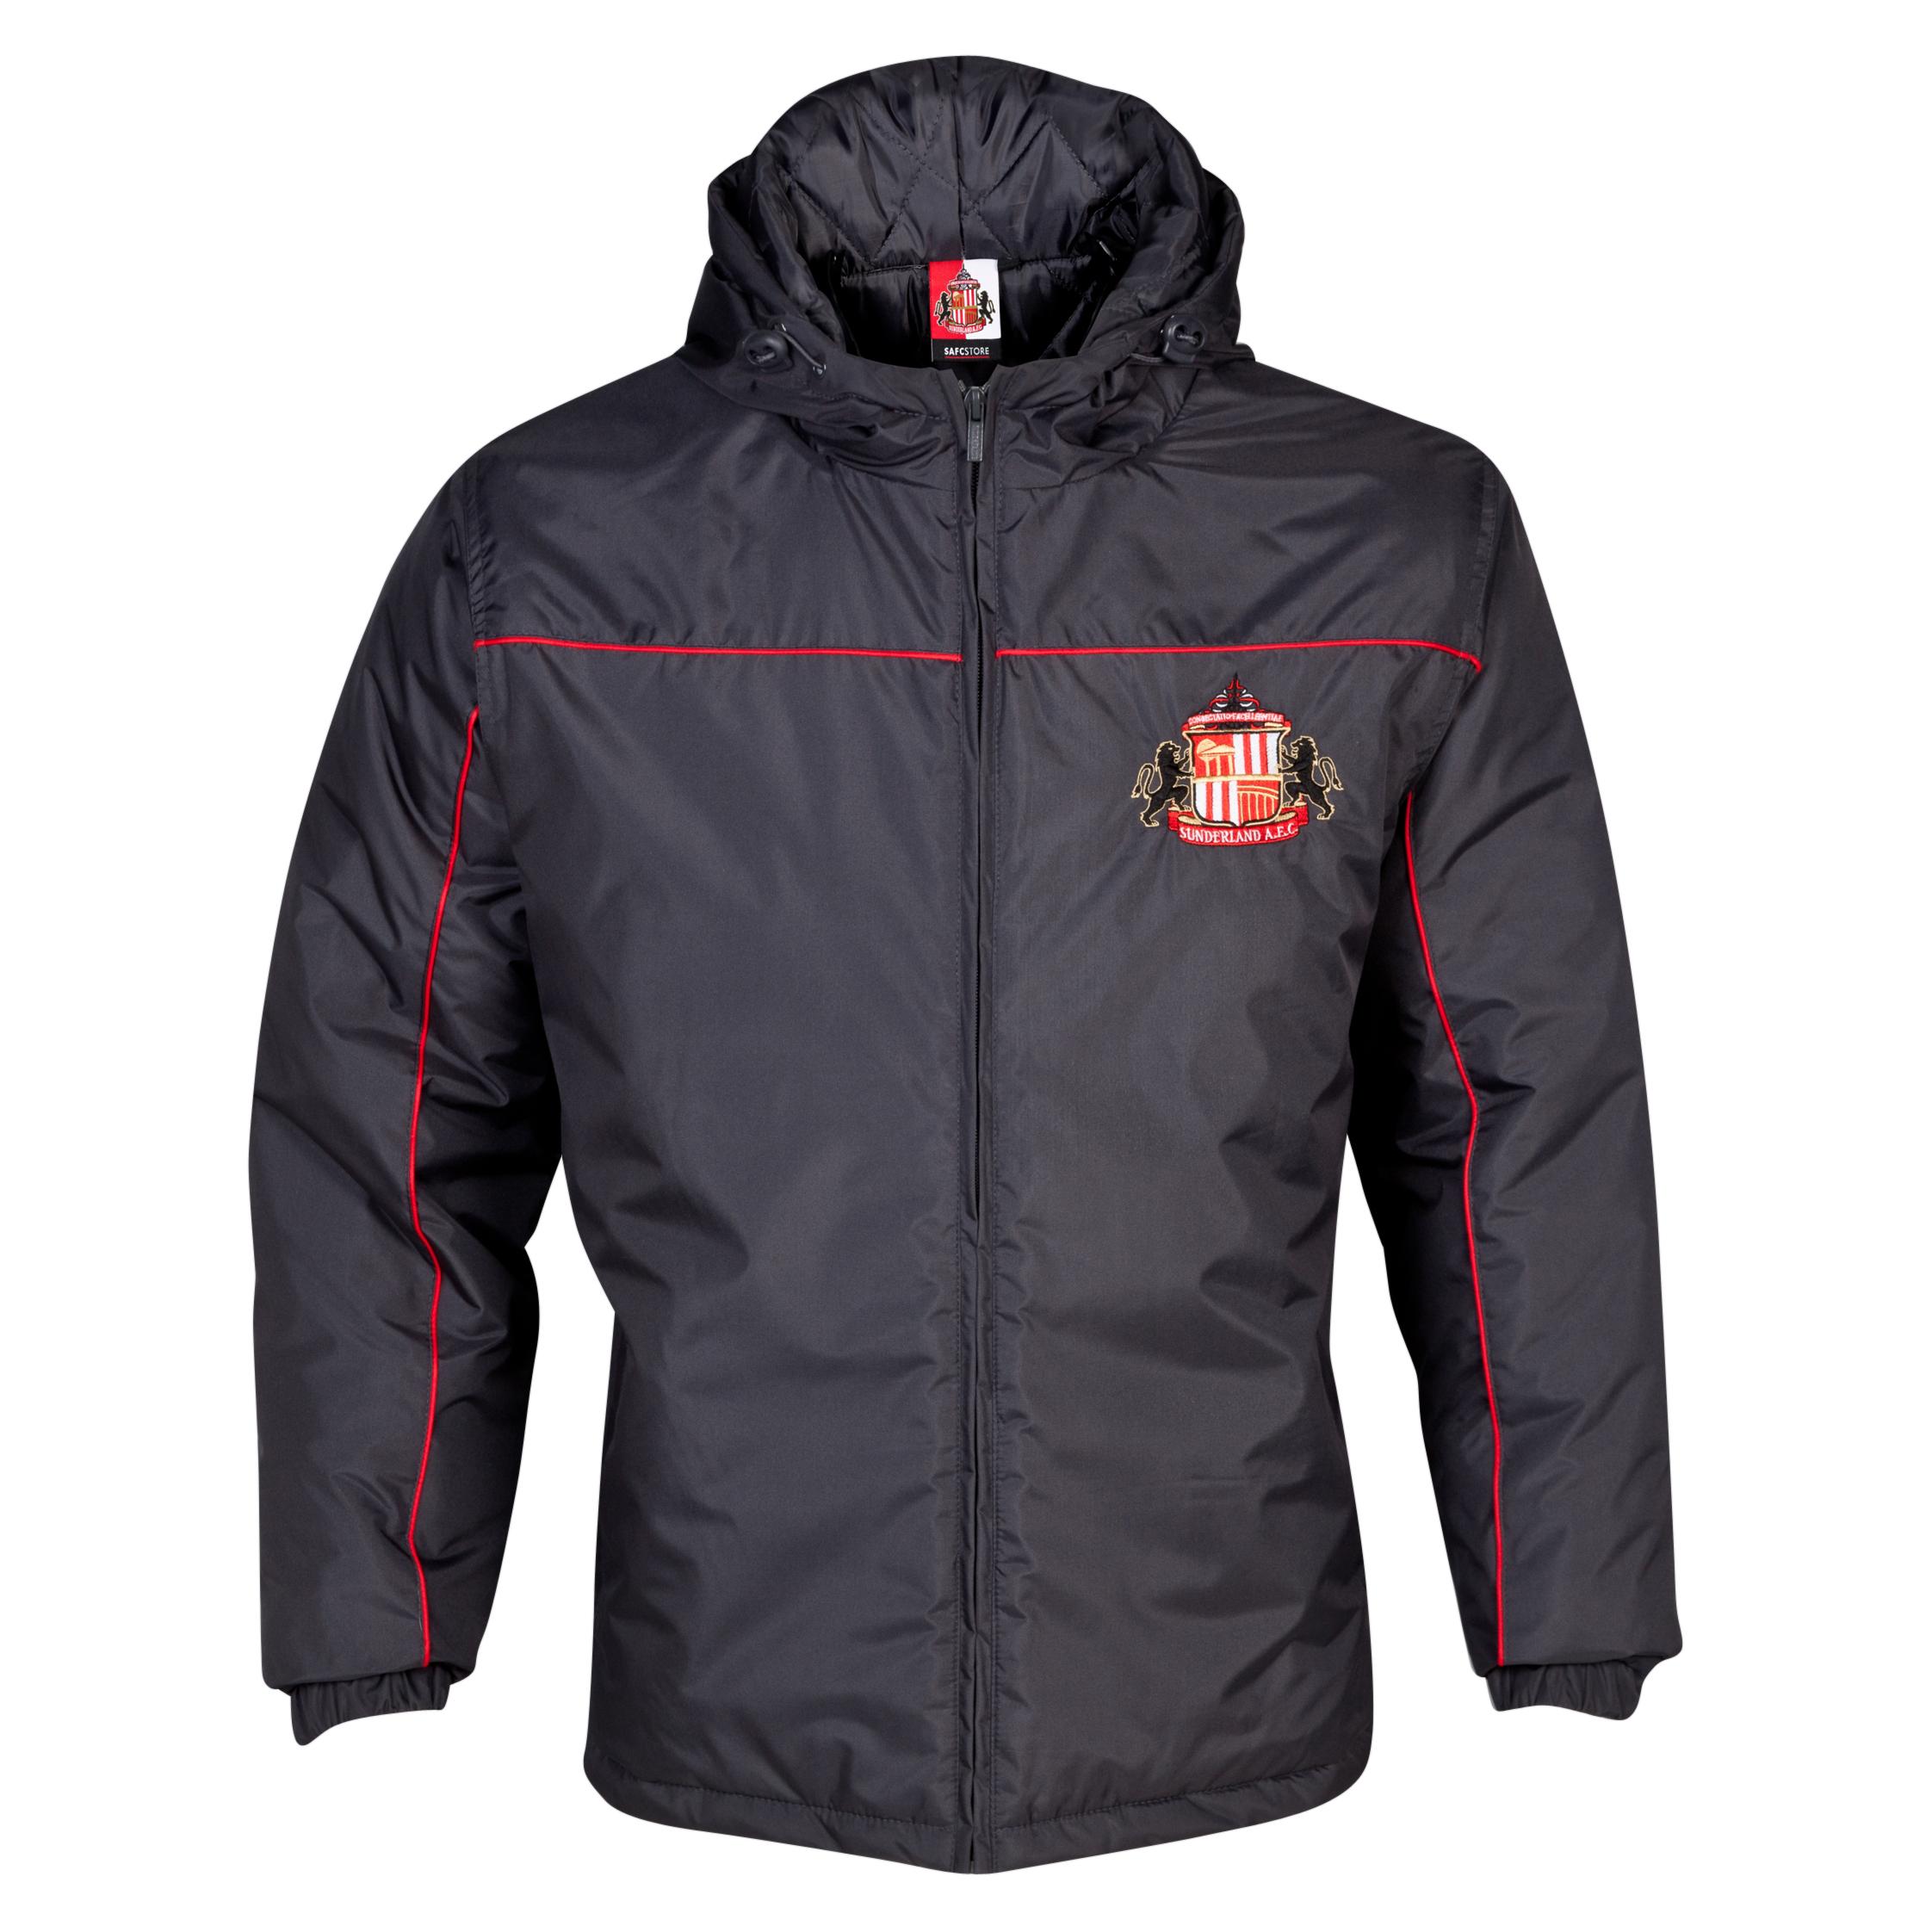 Sunderland Essentials Match Coat - Older Boys Dk Grey